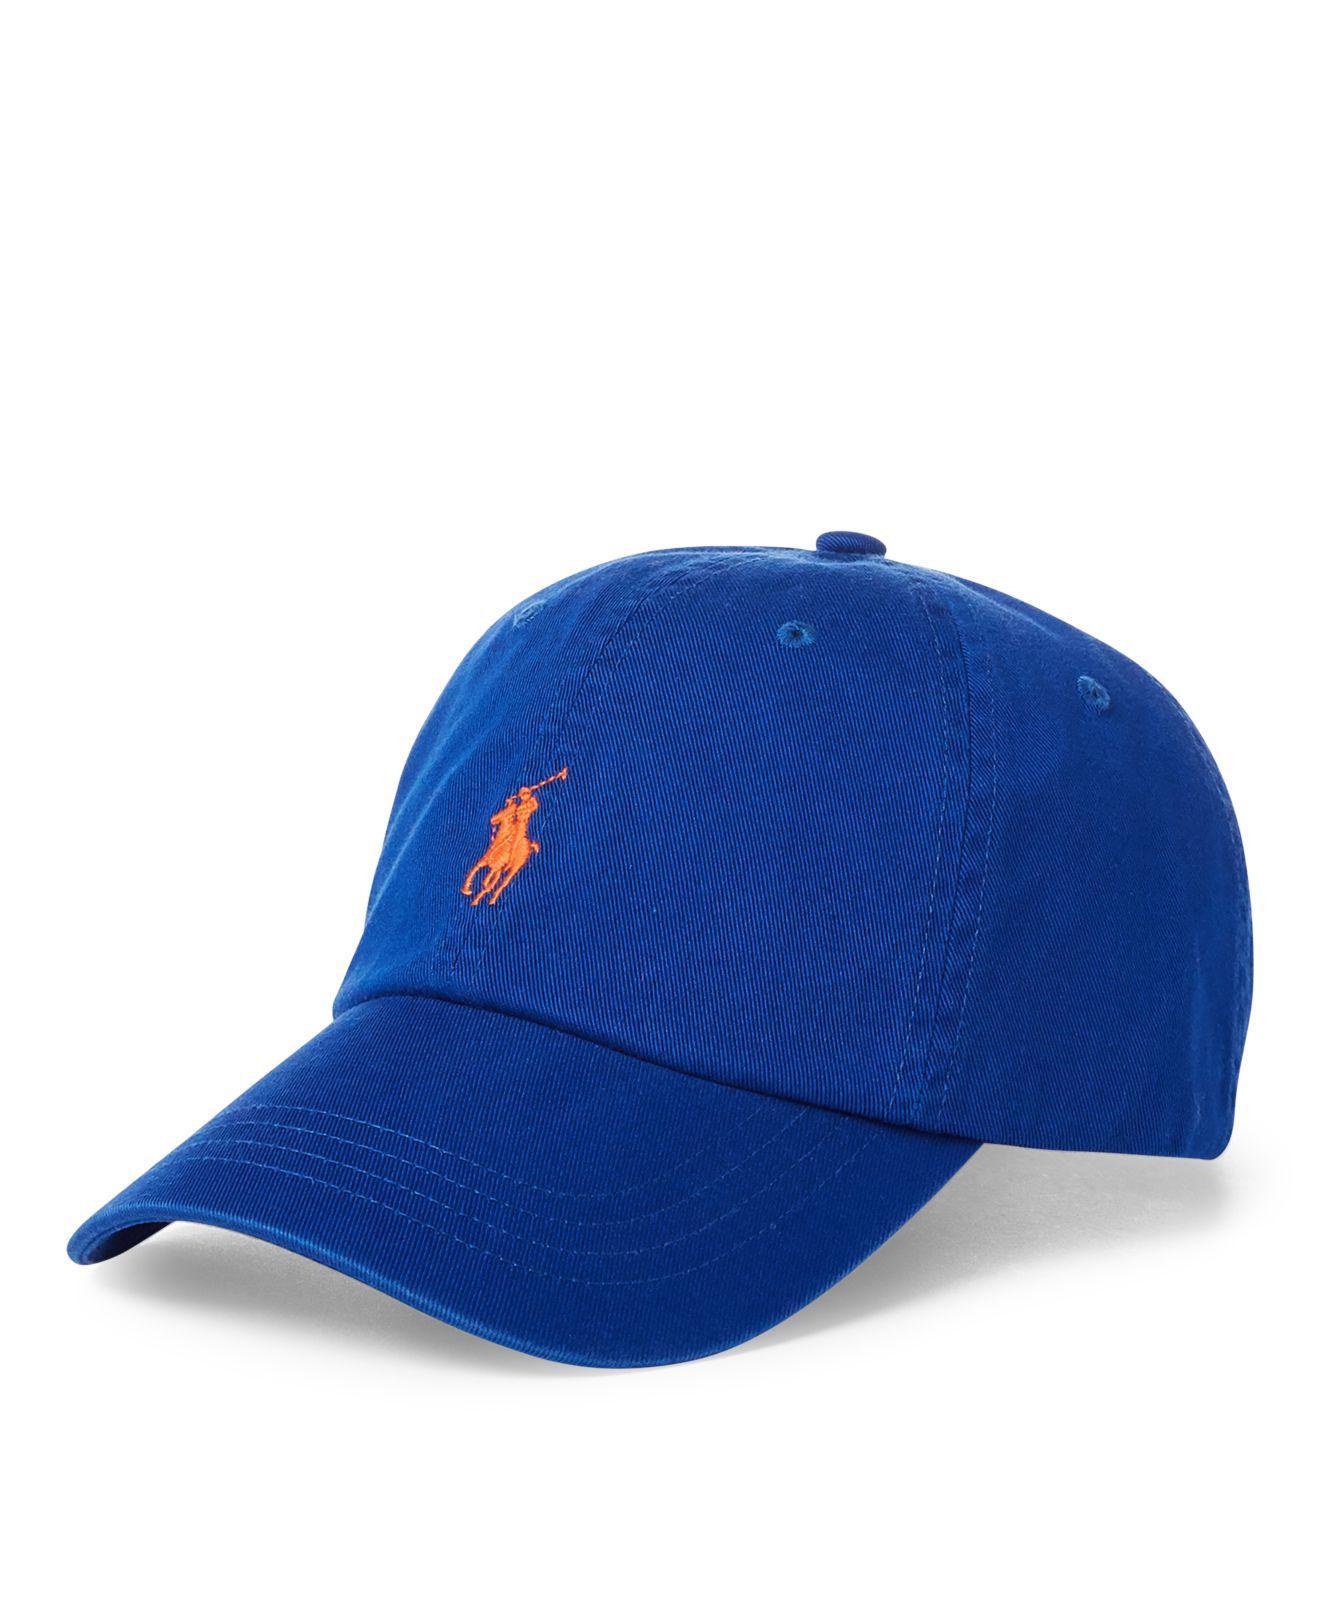 Lyst - Polo Ralph Lauren Cotton Chino Baseball Cap in Blue for Men 0d8f10e9eaf2